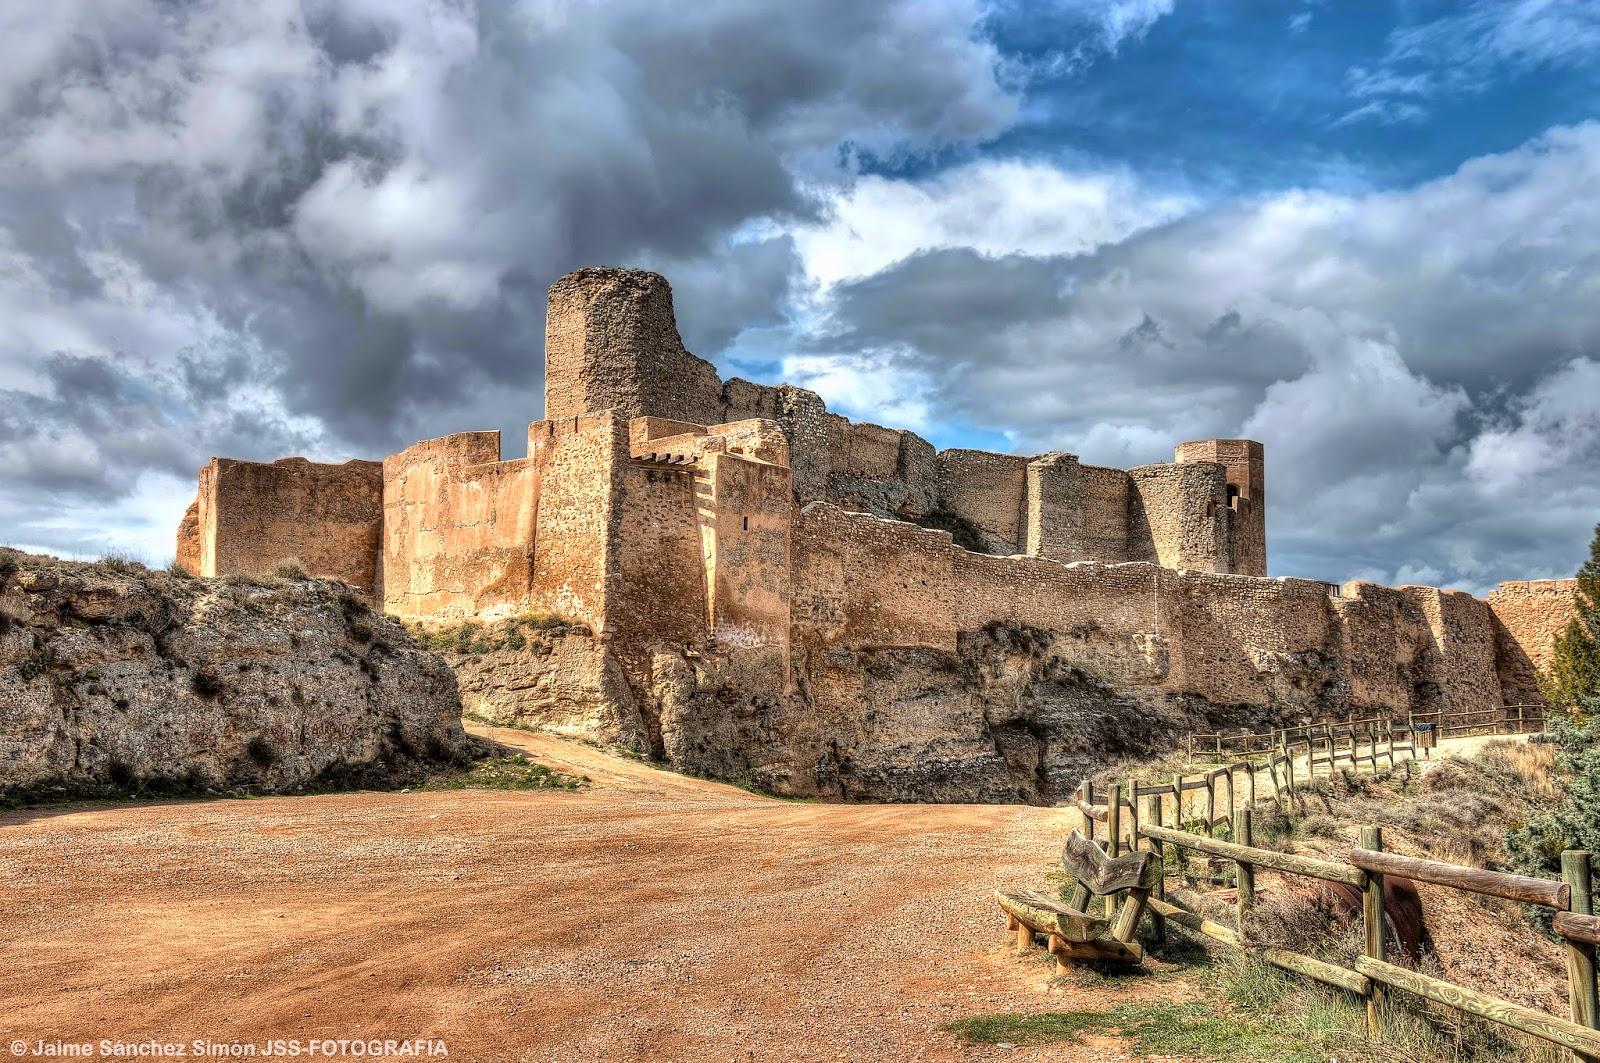 Jaime s nchez sim n jss fotografia castillo de ayud - Castillo de ayud ...